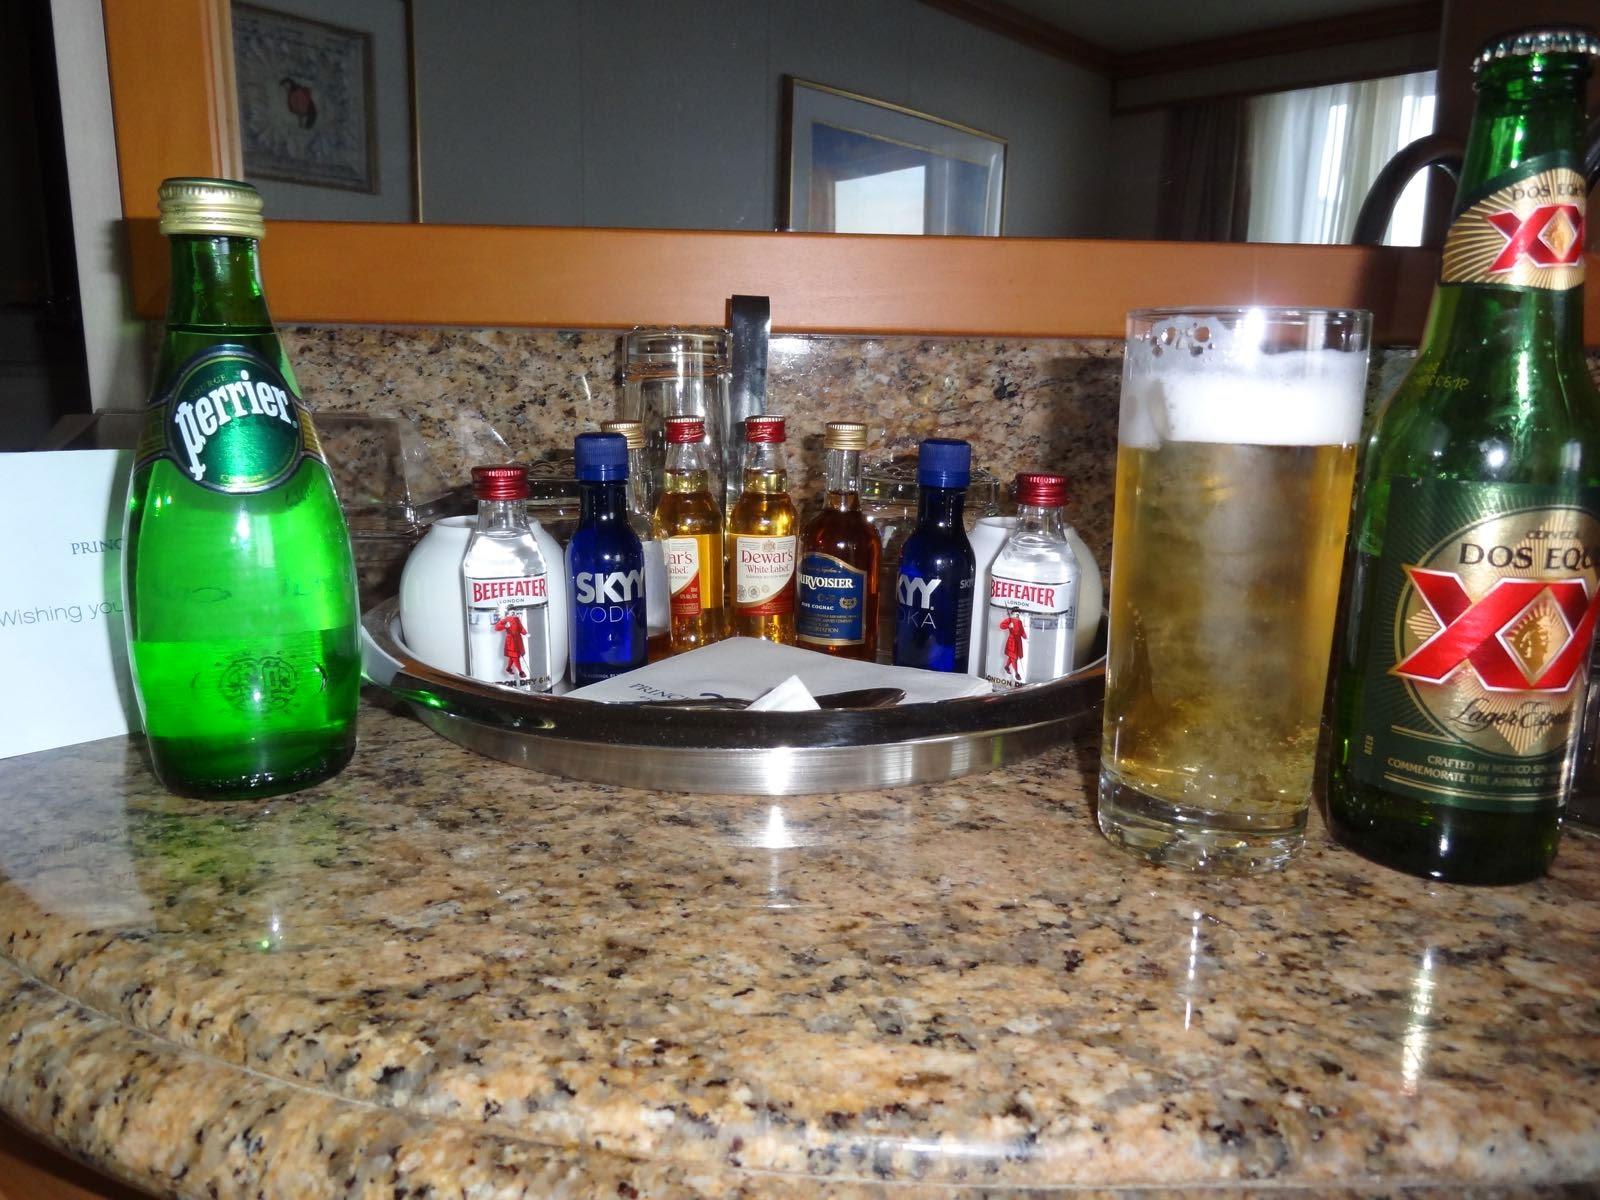 The free mini bar